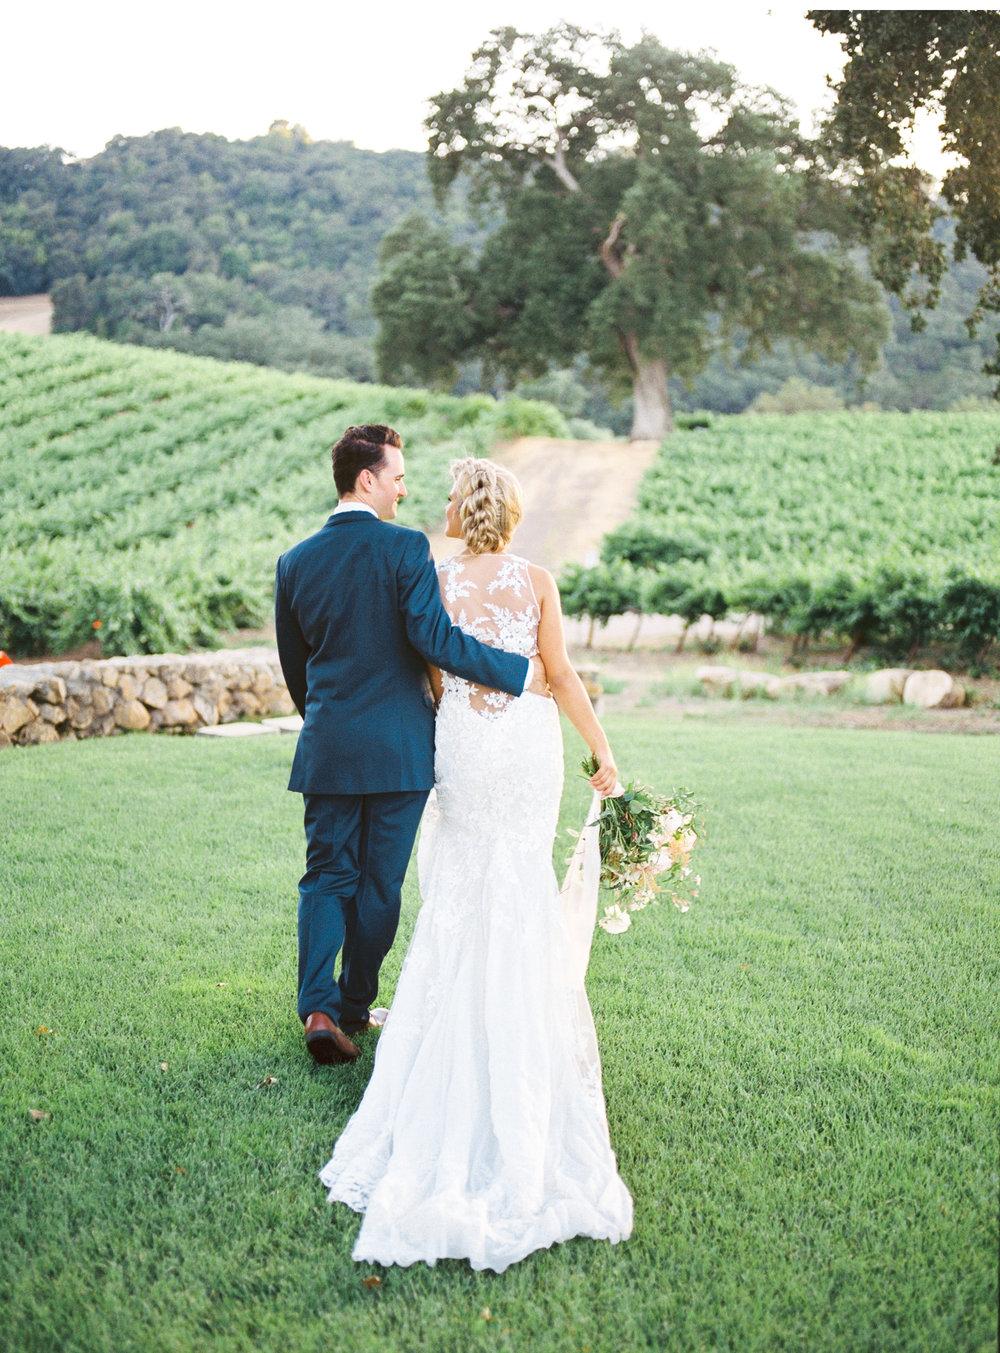 Malibu-Weddings-Natalie-Schutt-Photography_11.jpg